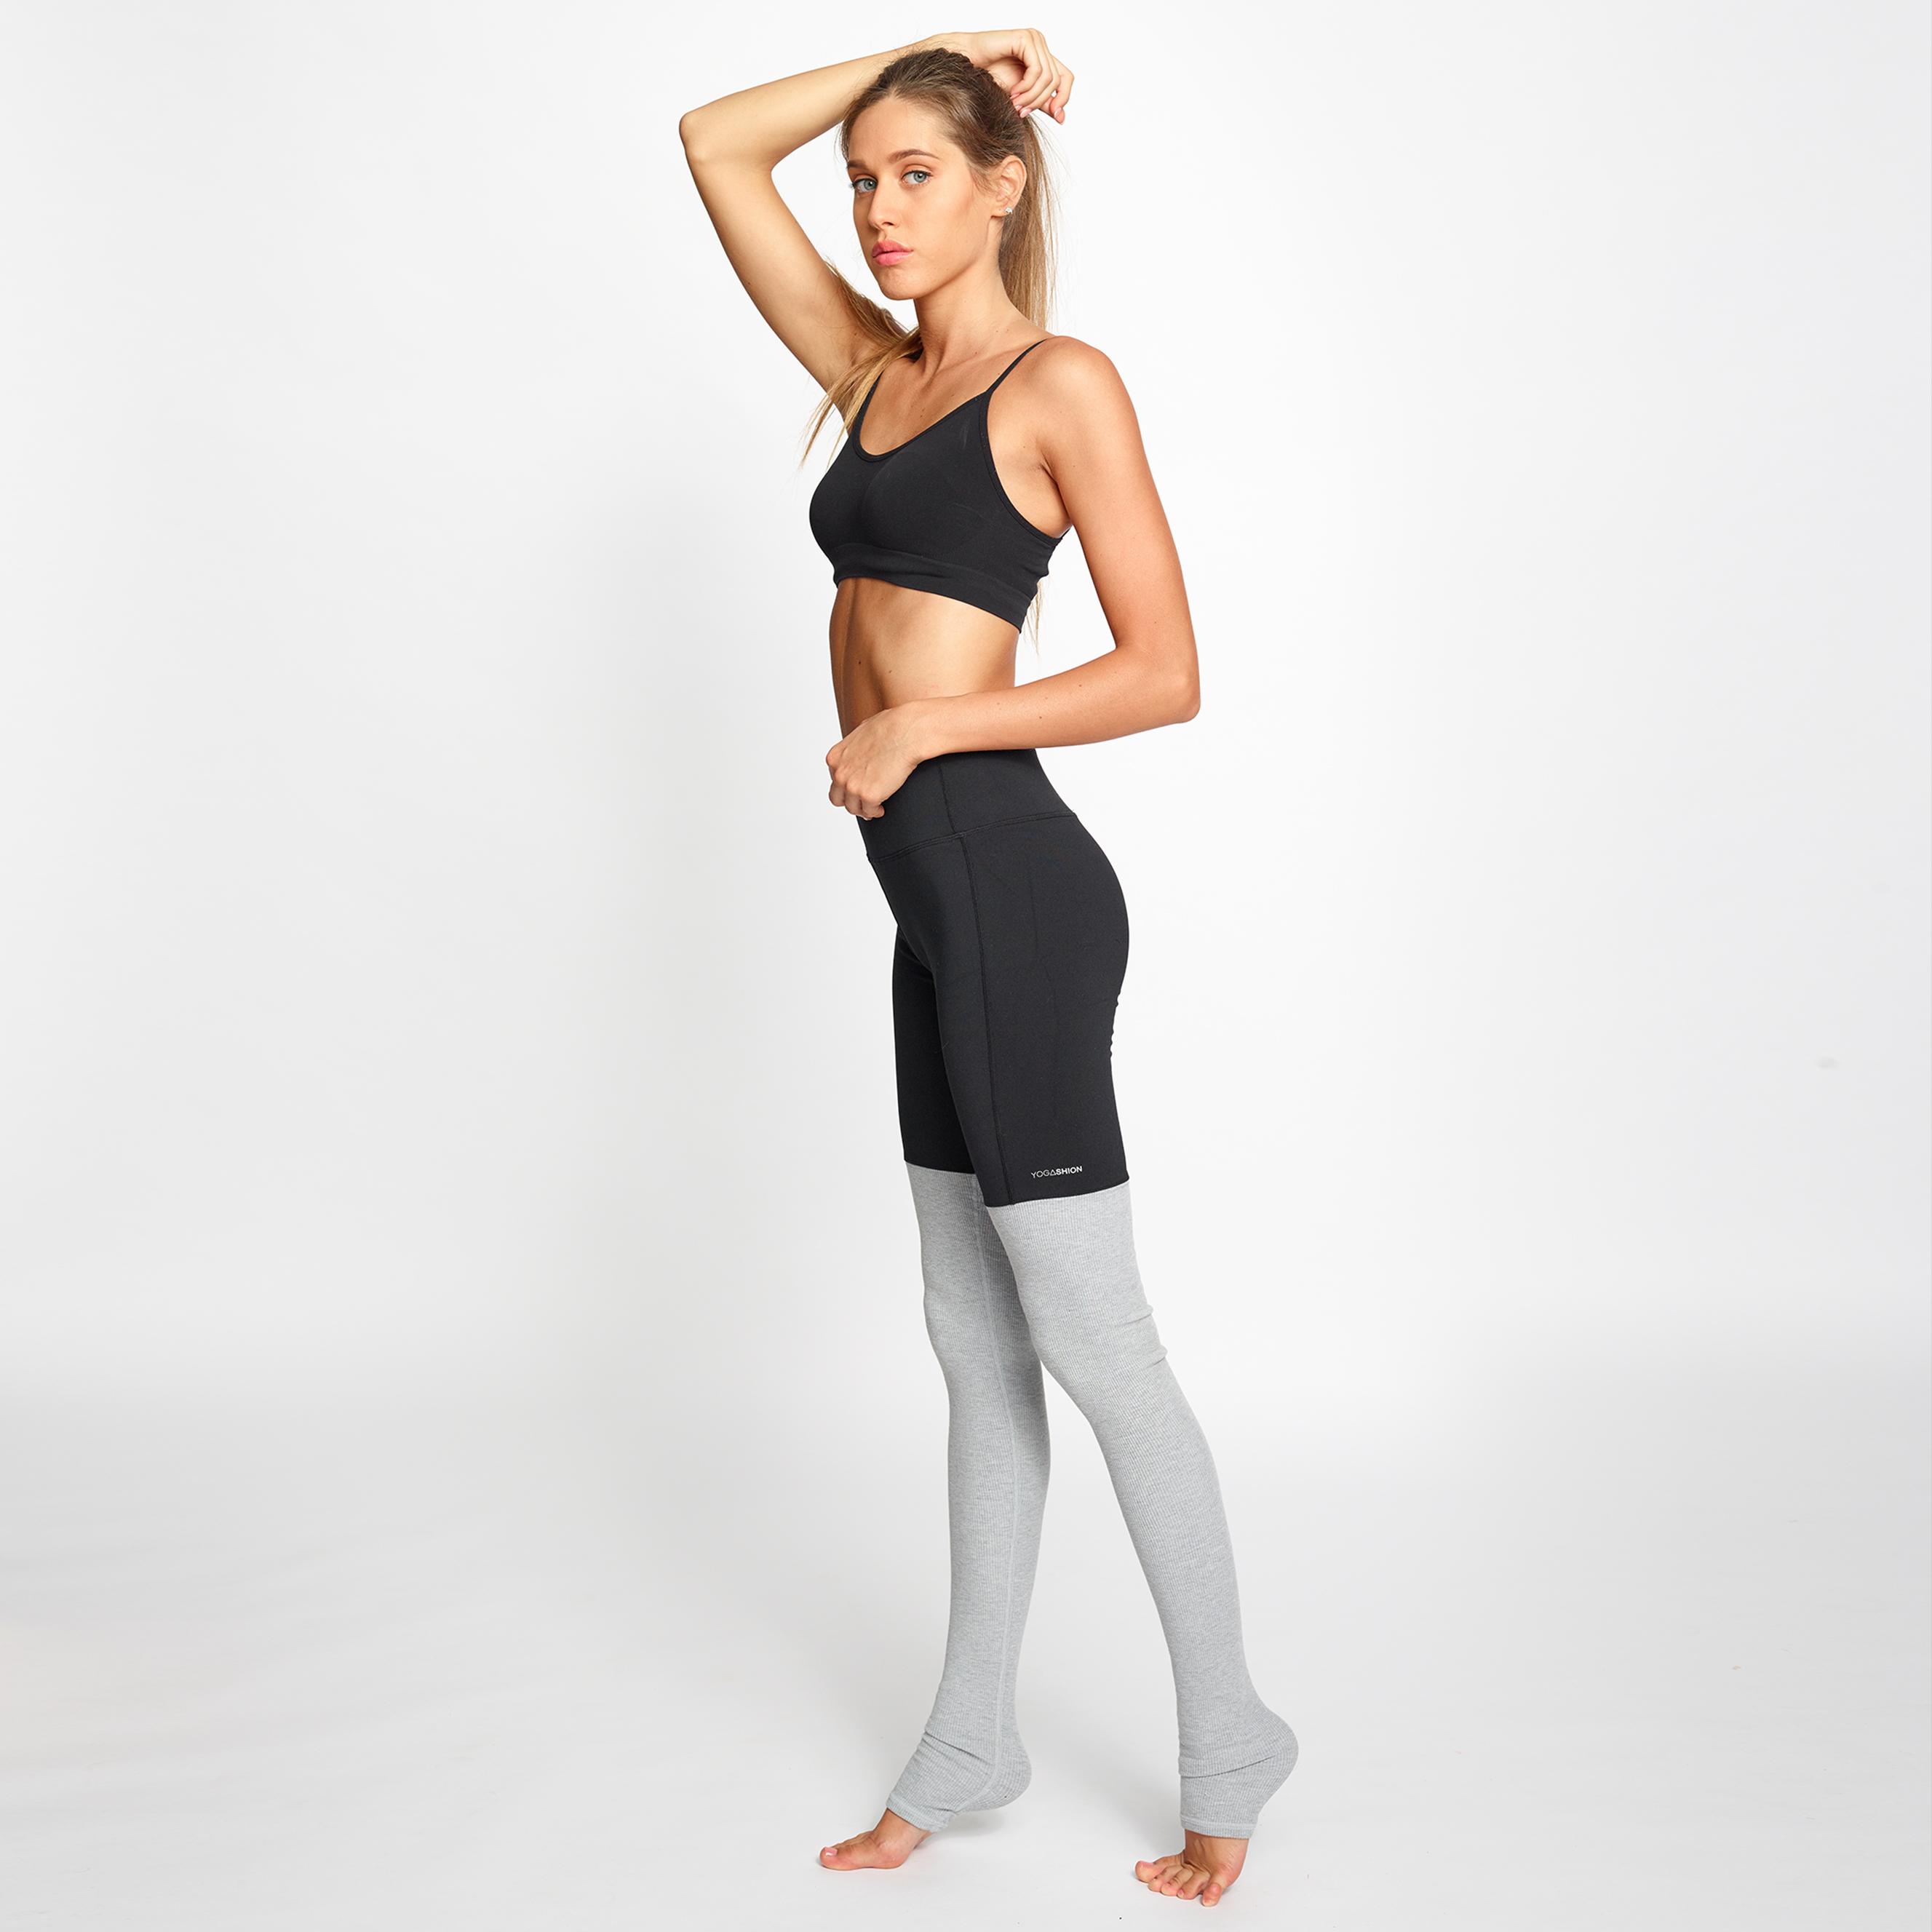 leggings fitness Yogashion bicolore grigio